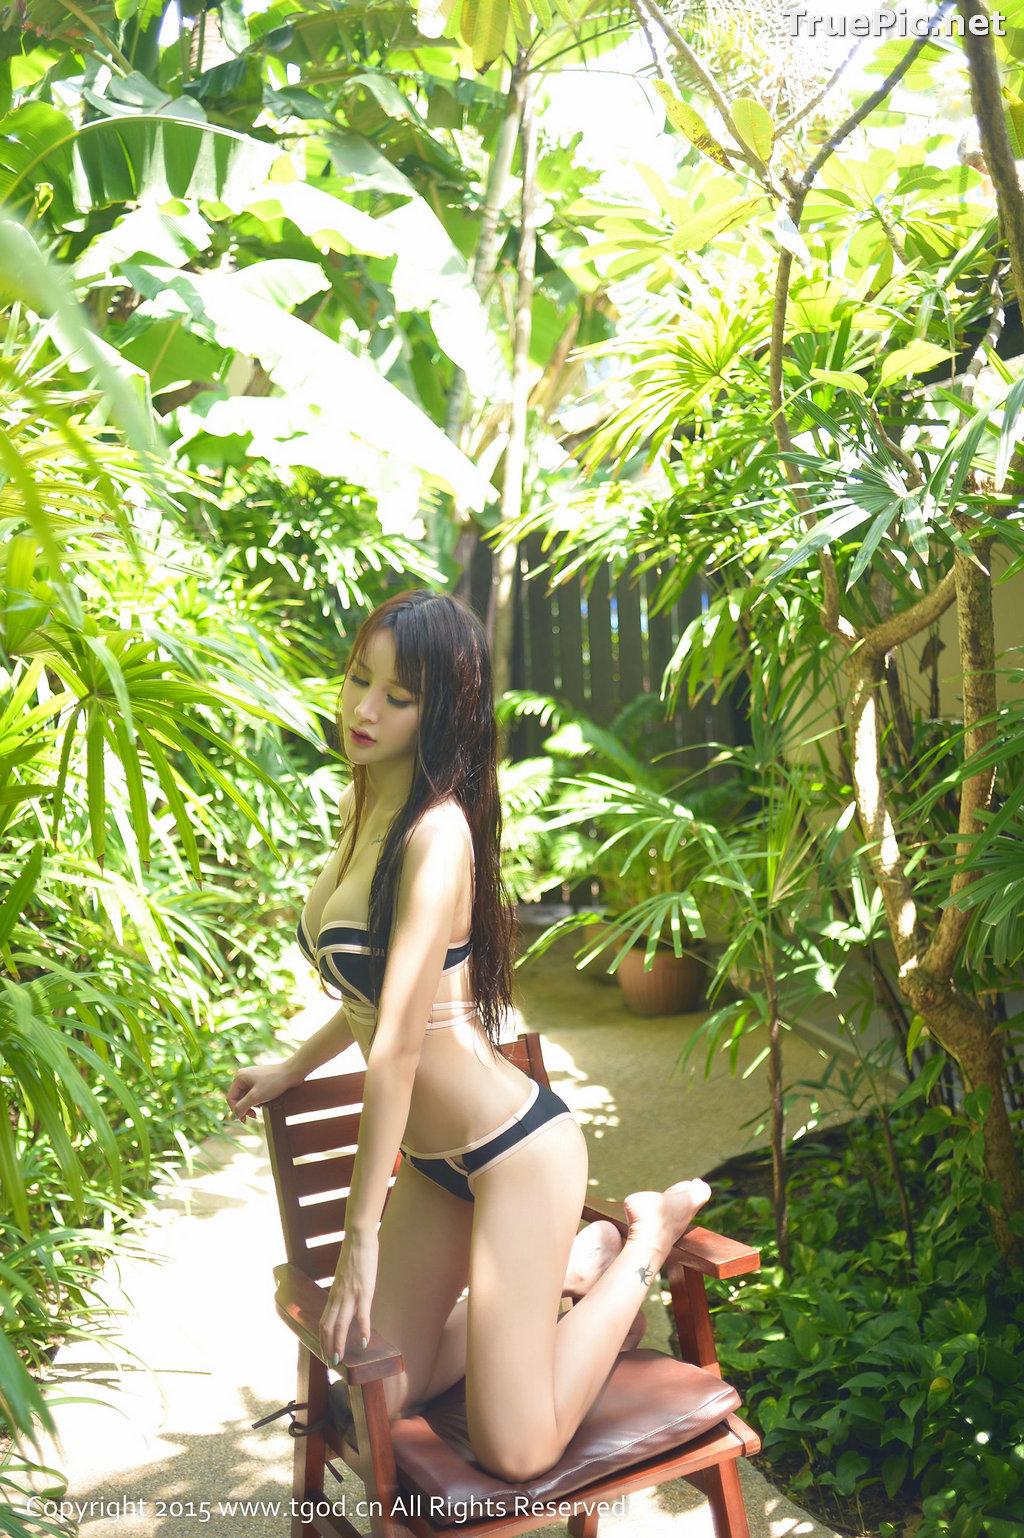 Image TGOD 2015-11-10 - Chinese Sexy Model - Cheryl (青树) - TruePic.net - Picture-28